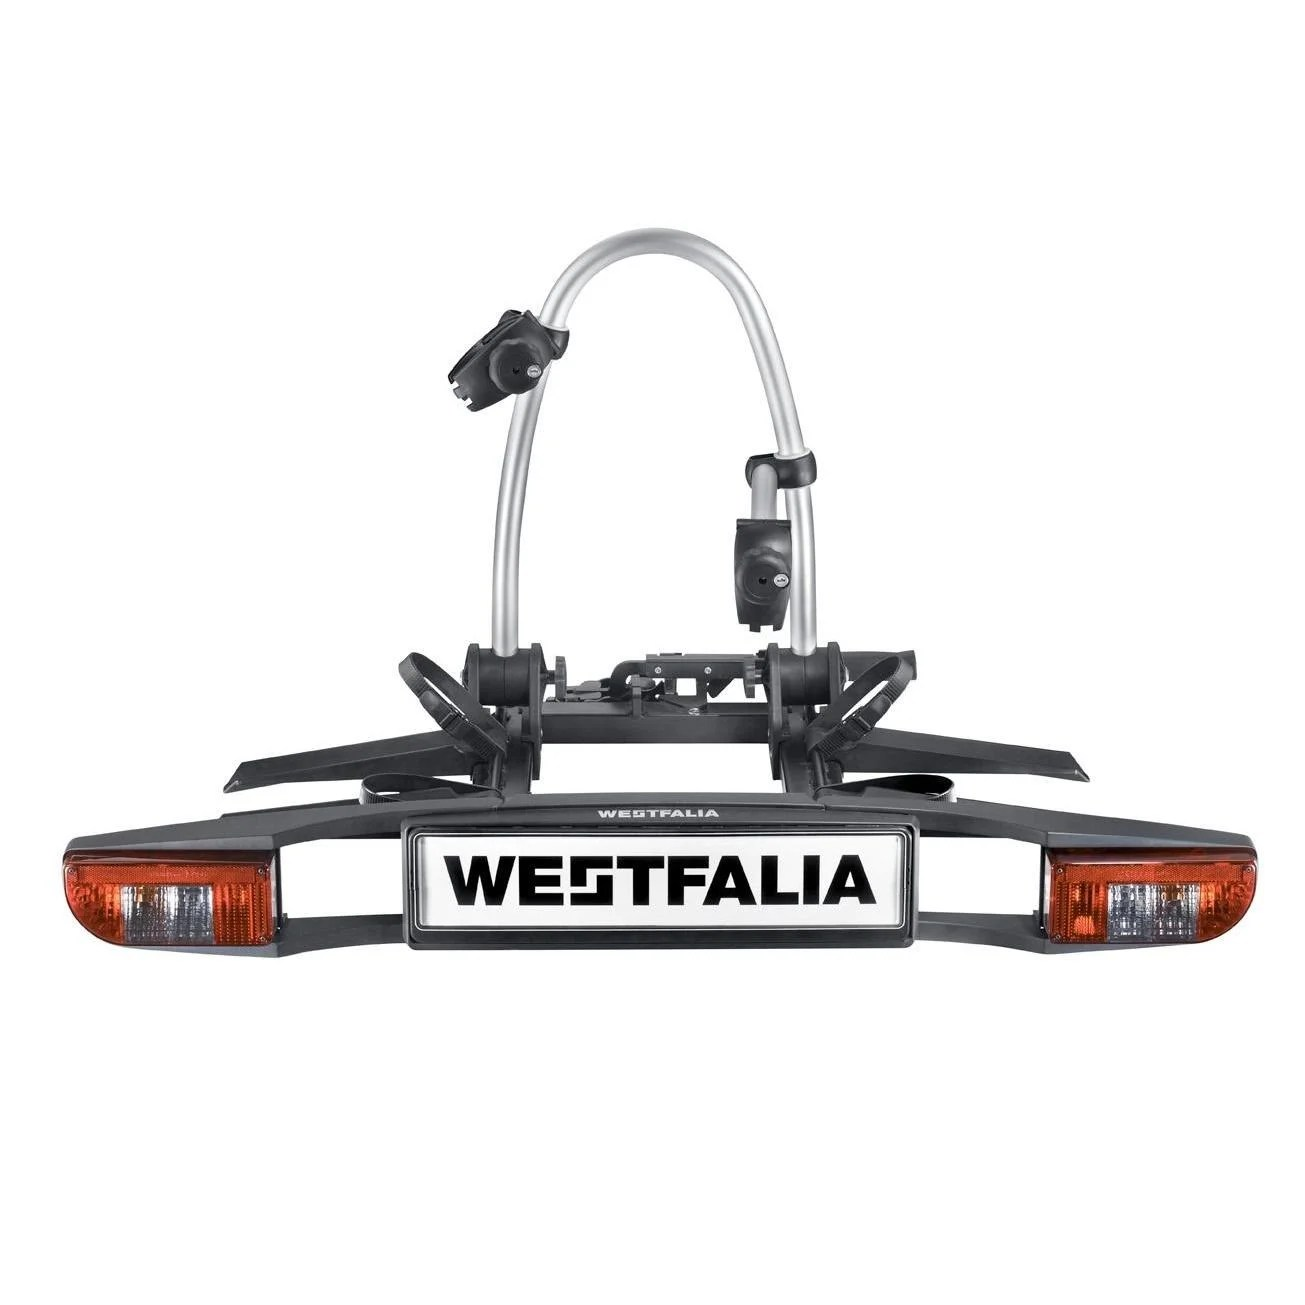 Westfalia Portilo Towbar Mounted Folding 2 Bike Cycle Carrier